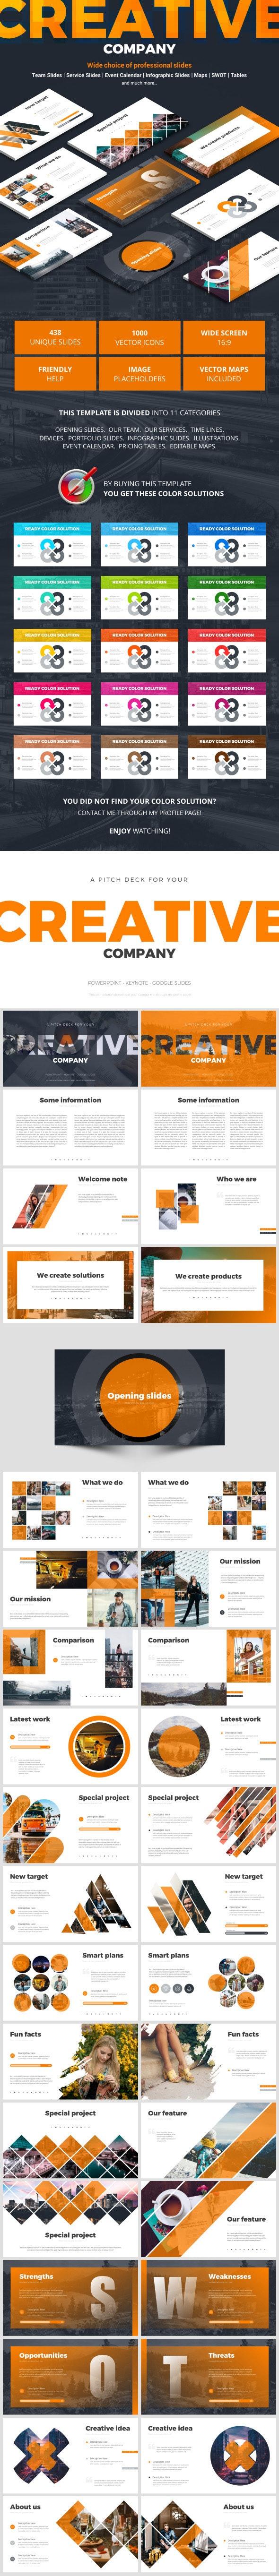 Creative Company - Google Slides Presentation Templates